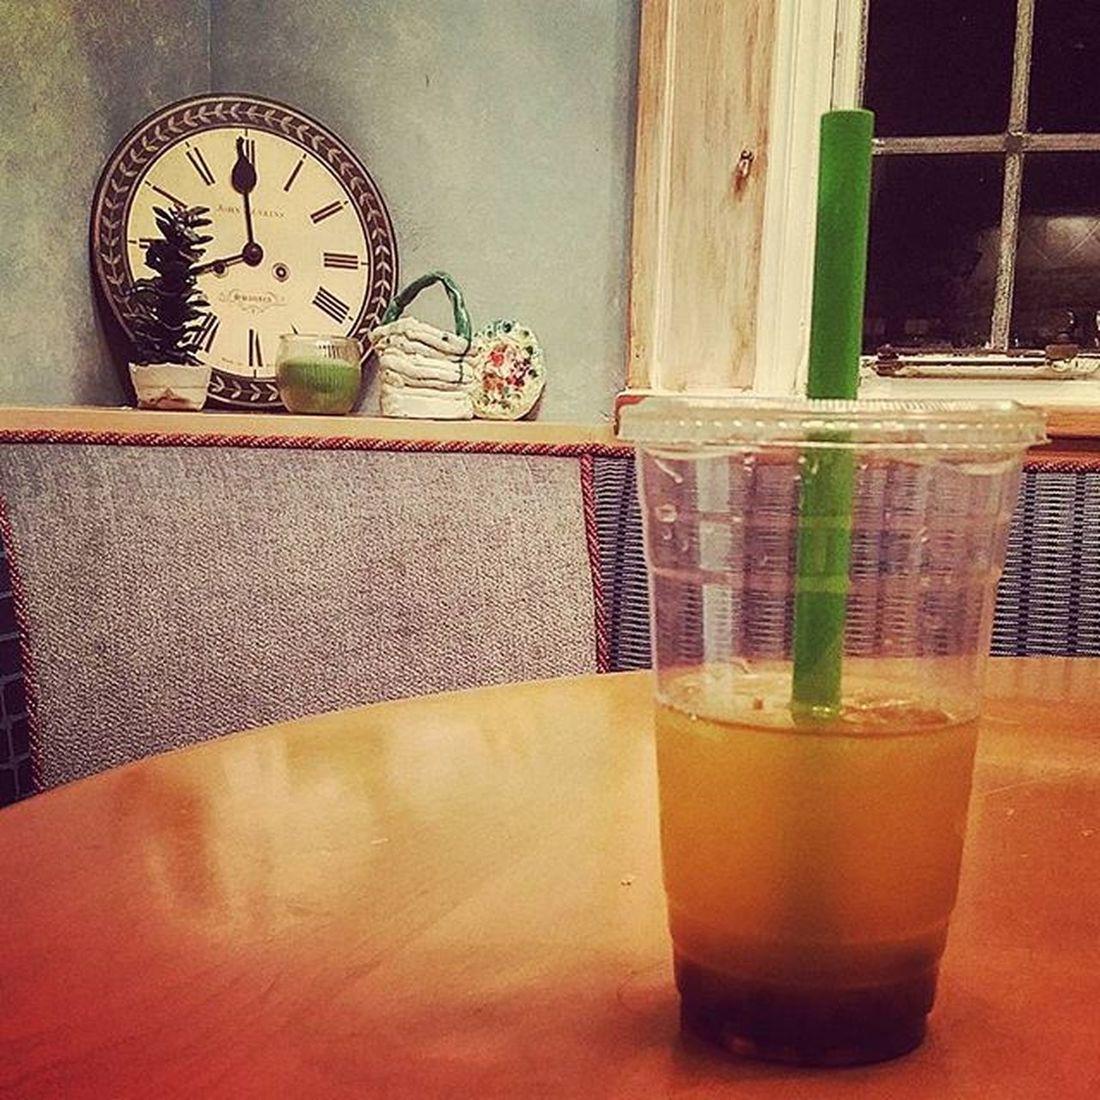 🌰🍵🎑 Passionfruit Bubbletea Home Table Clocks Urban Indie Alternative Photography Latefall Winterisuponus ItsDecember Happyholidays Happyhannukah MerryChristmas HappyKwanzaa